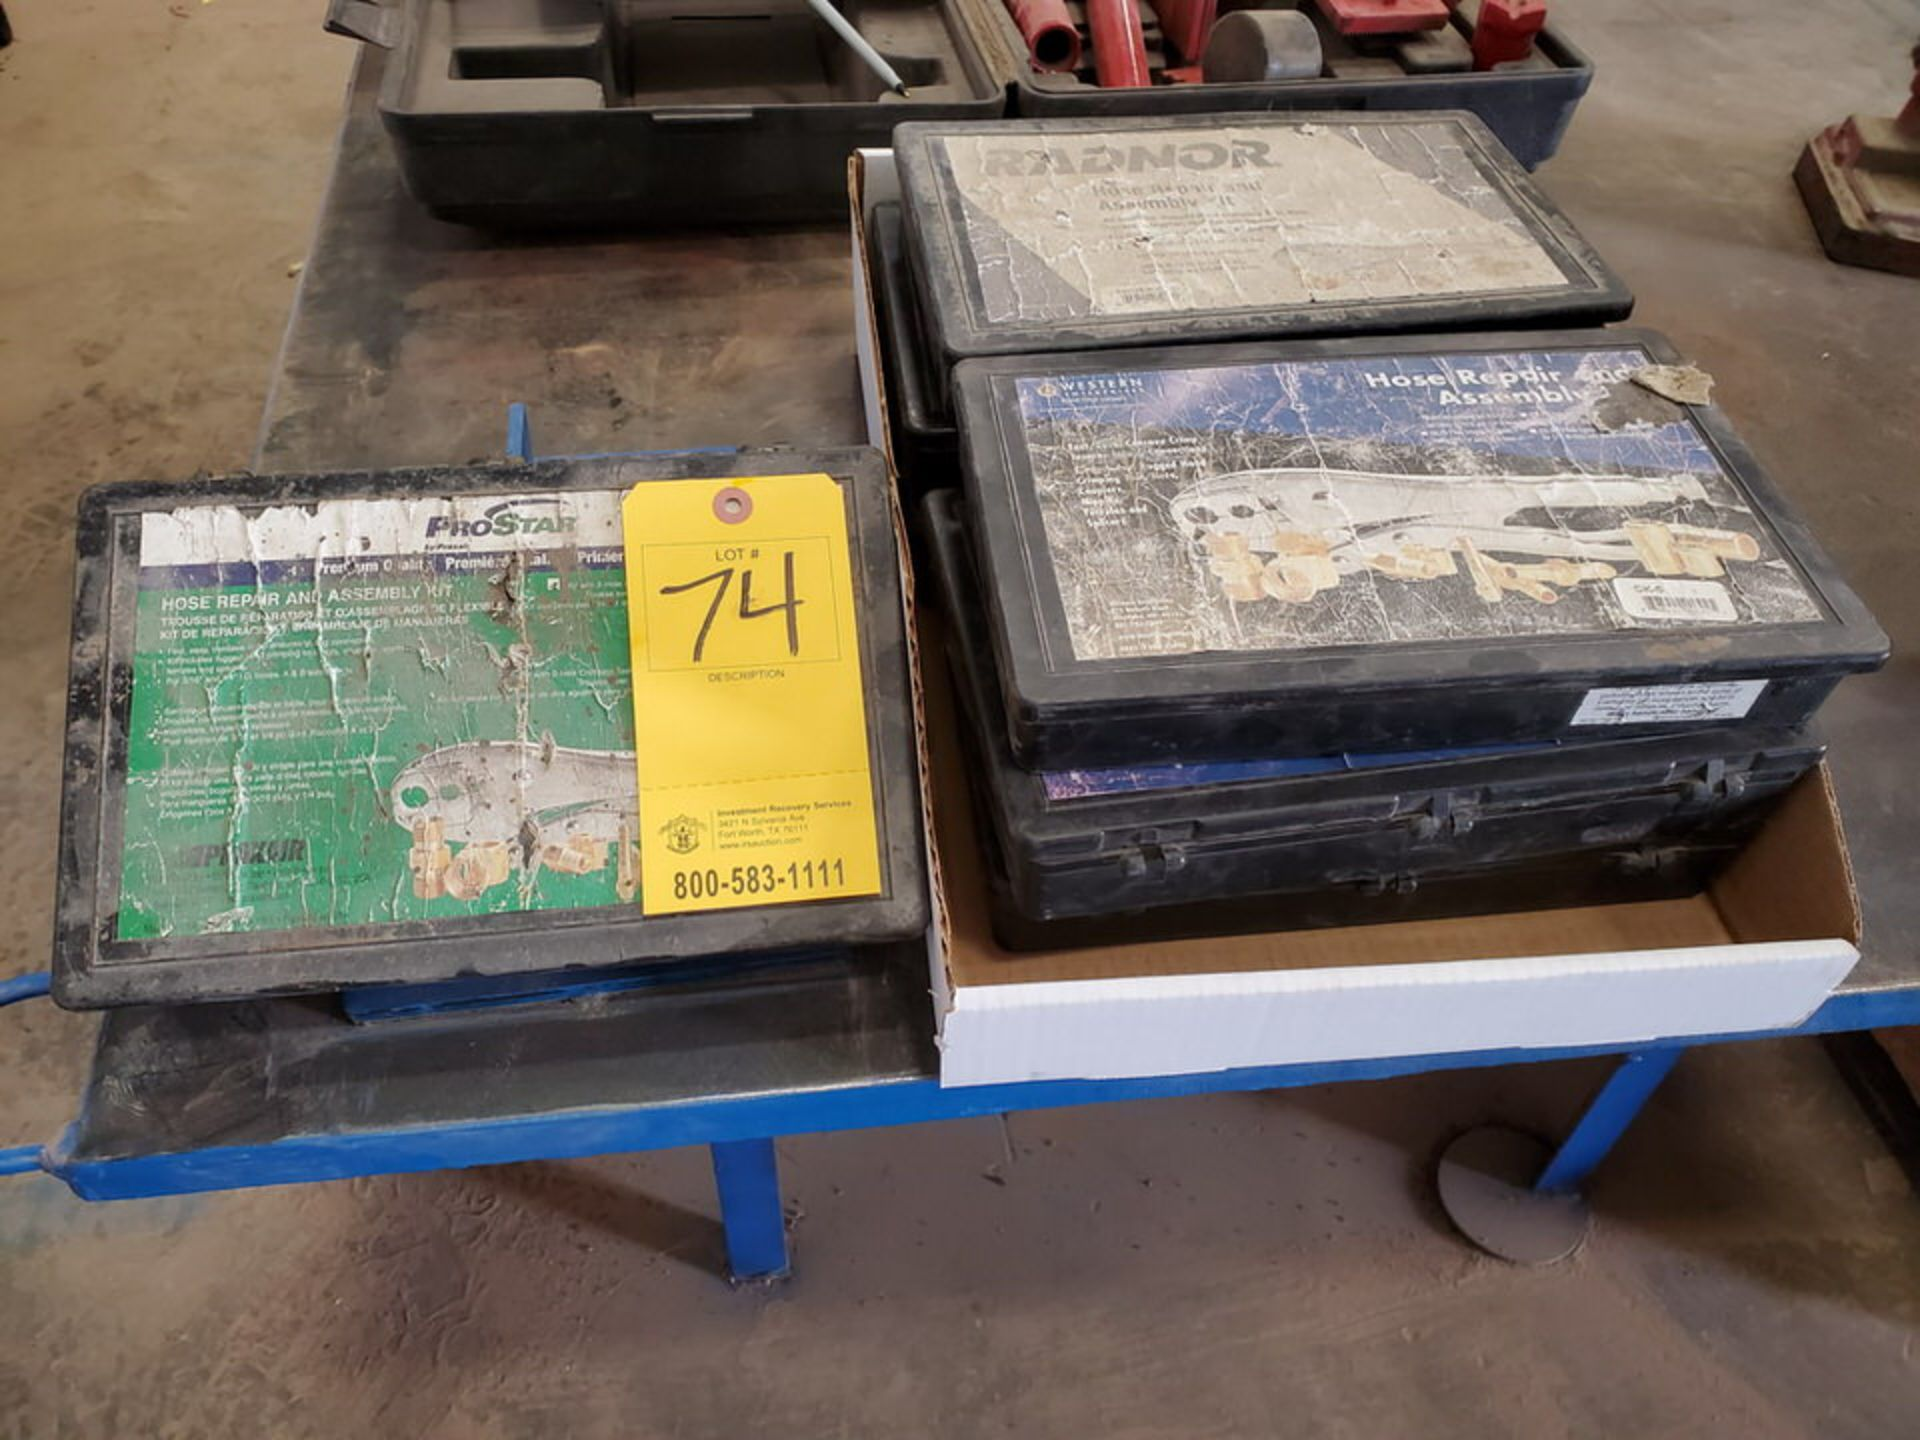 Radnor & Frostar (7) Hose Repair & Assy Kits - Image 4 of 4